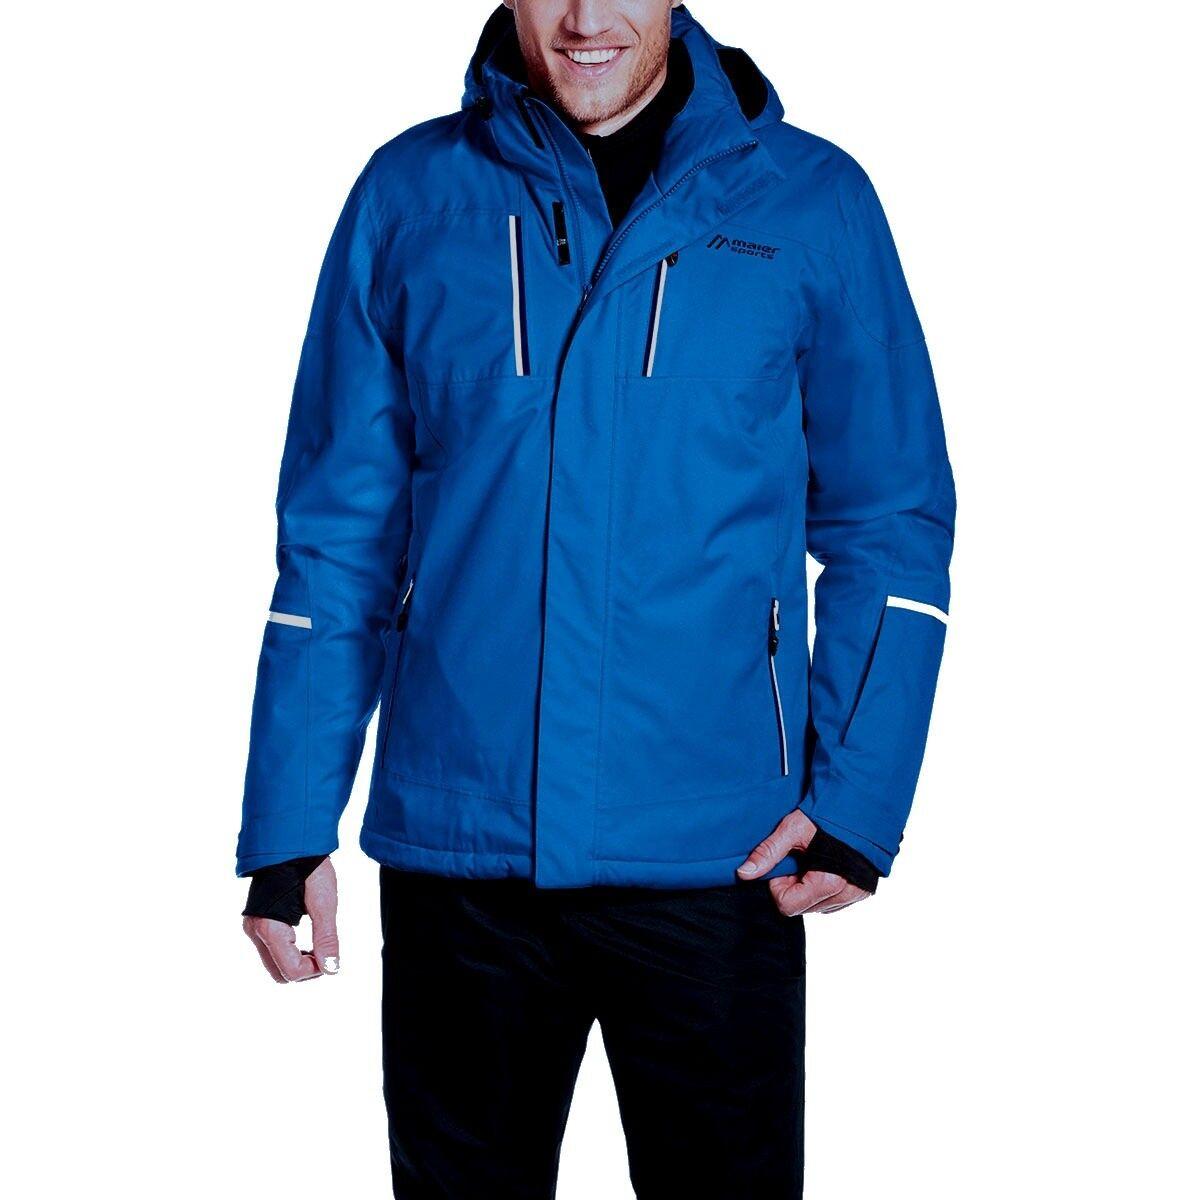 Maier Sports Lupus Skijacke blau